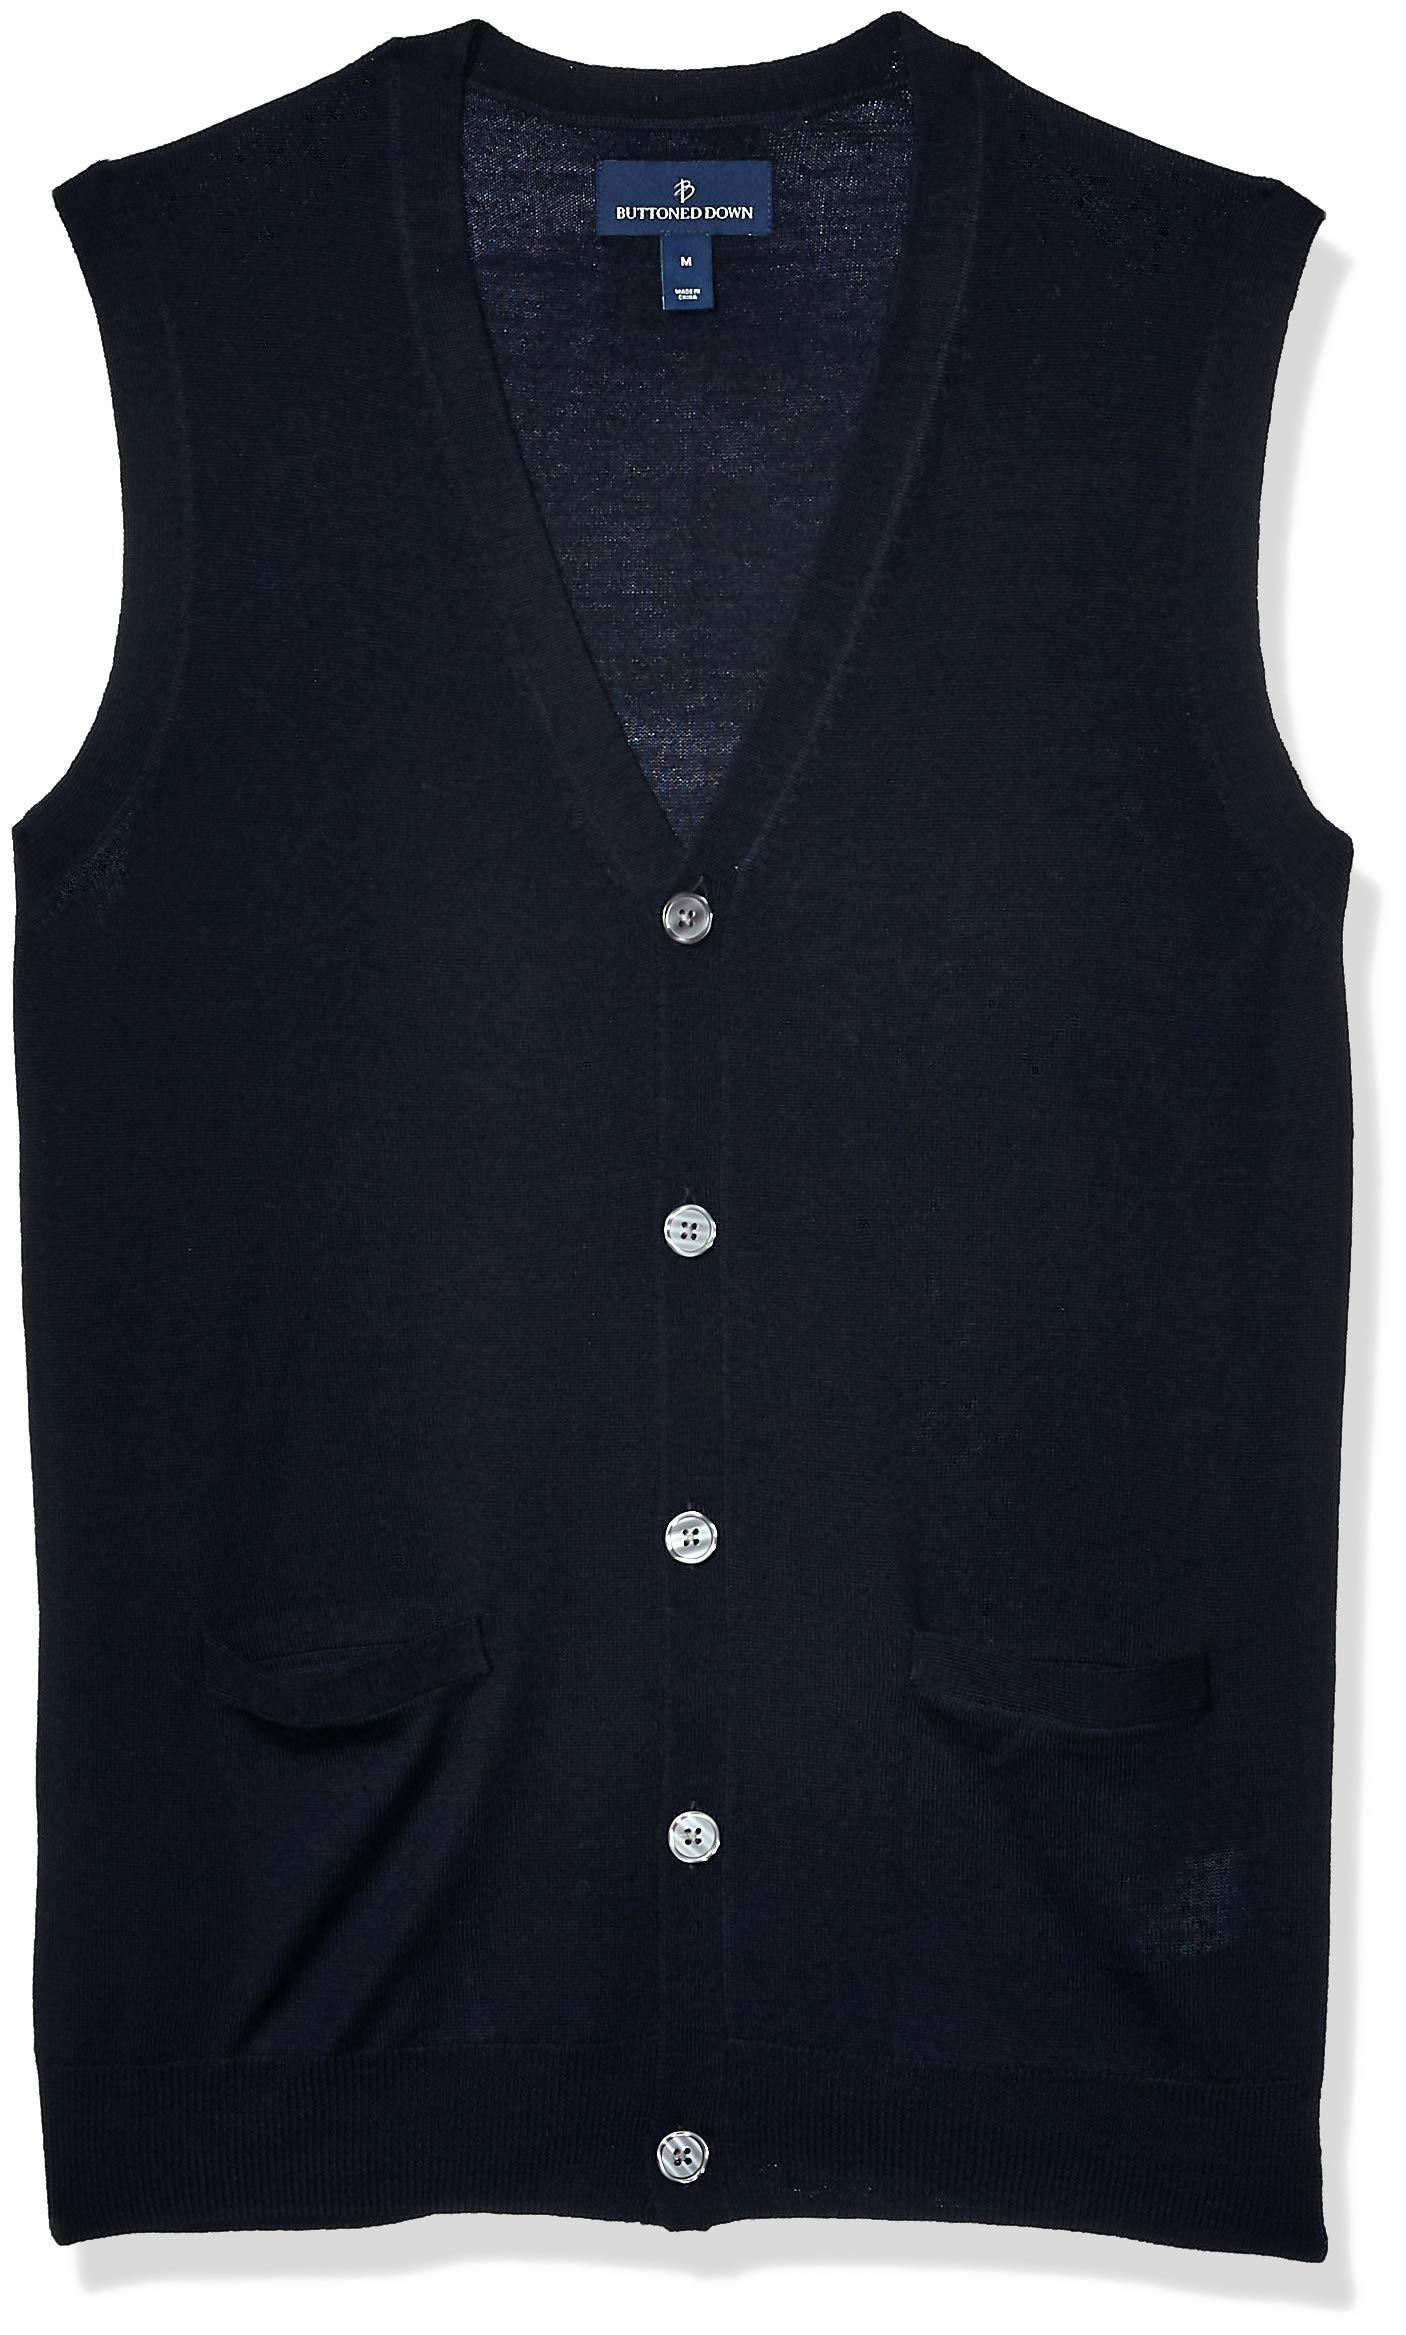 Amazon Brand - Buttoned Down Men's Italian Merino Wool Lightweight Cashwool Button-Front Sweater Vest, Midnight Navy Medium by Buttoned Down